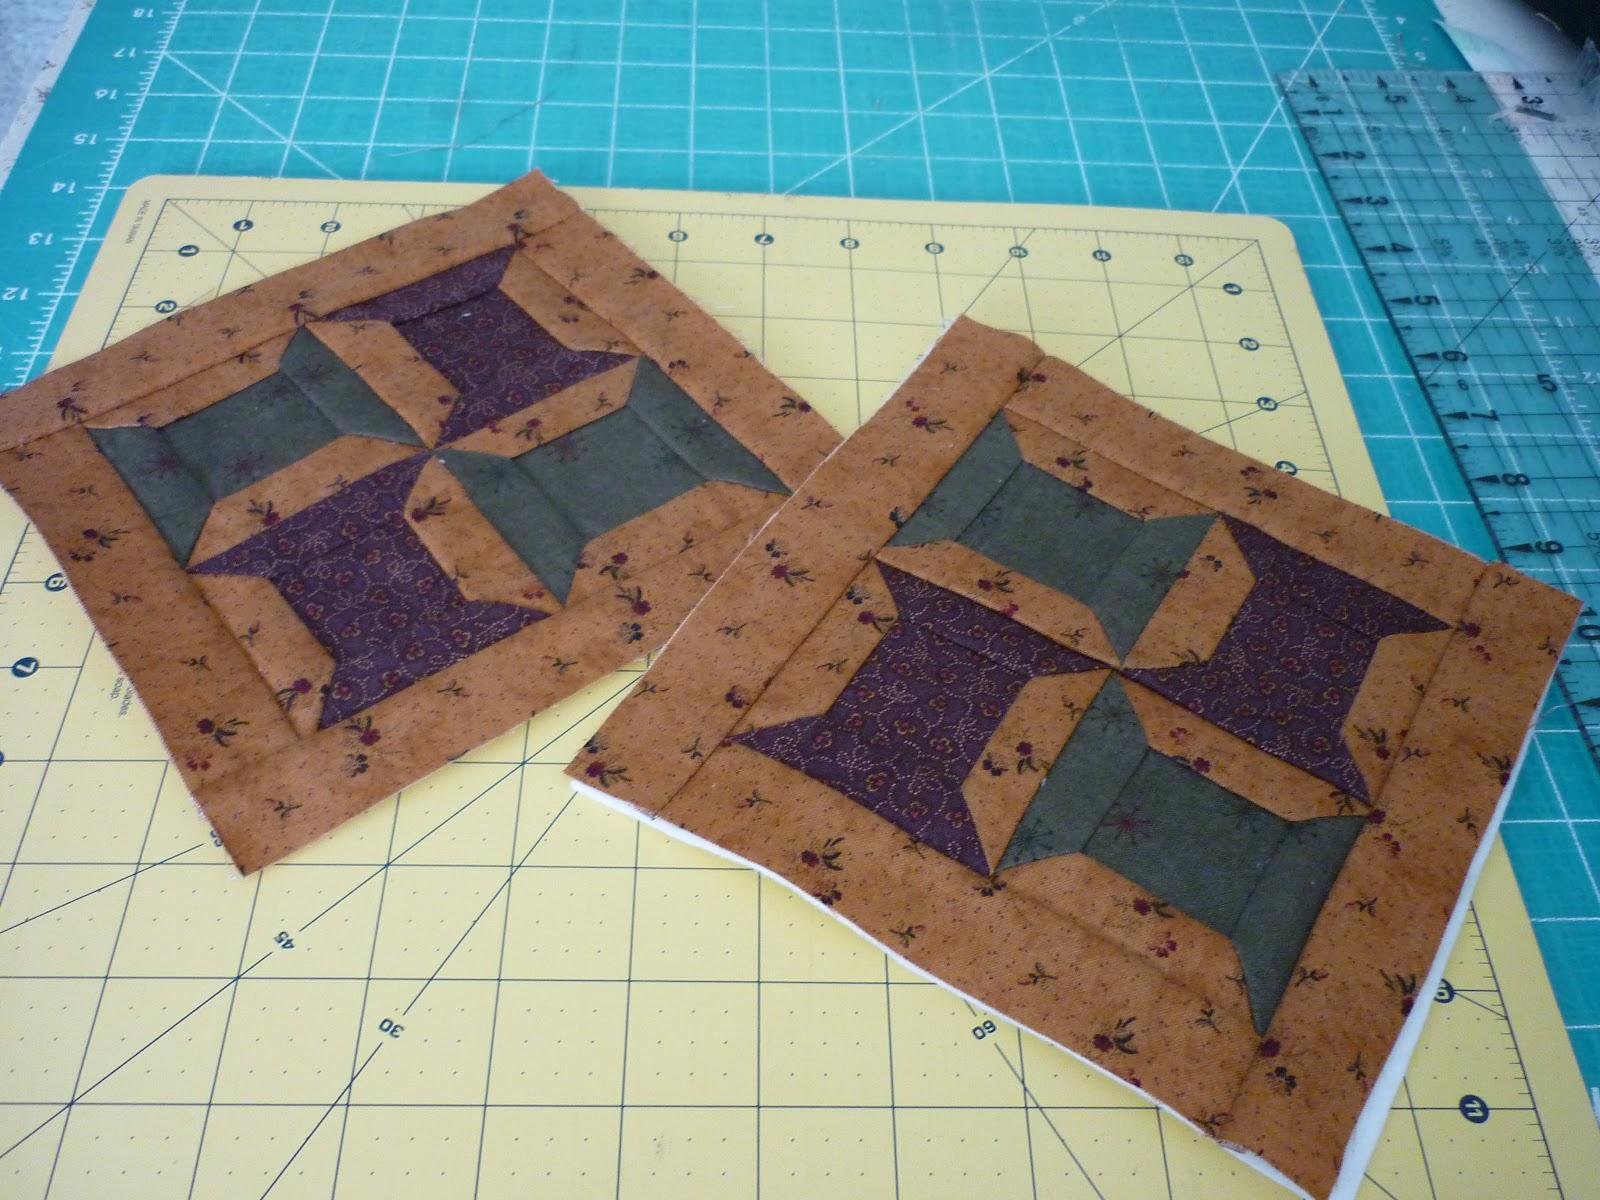 Casita del patchwork - La casita del patchwork ...